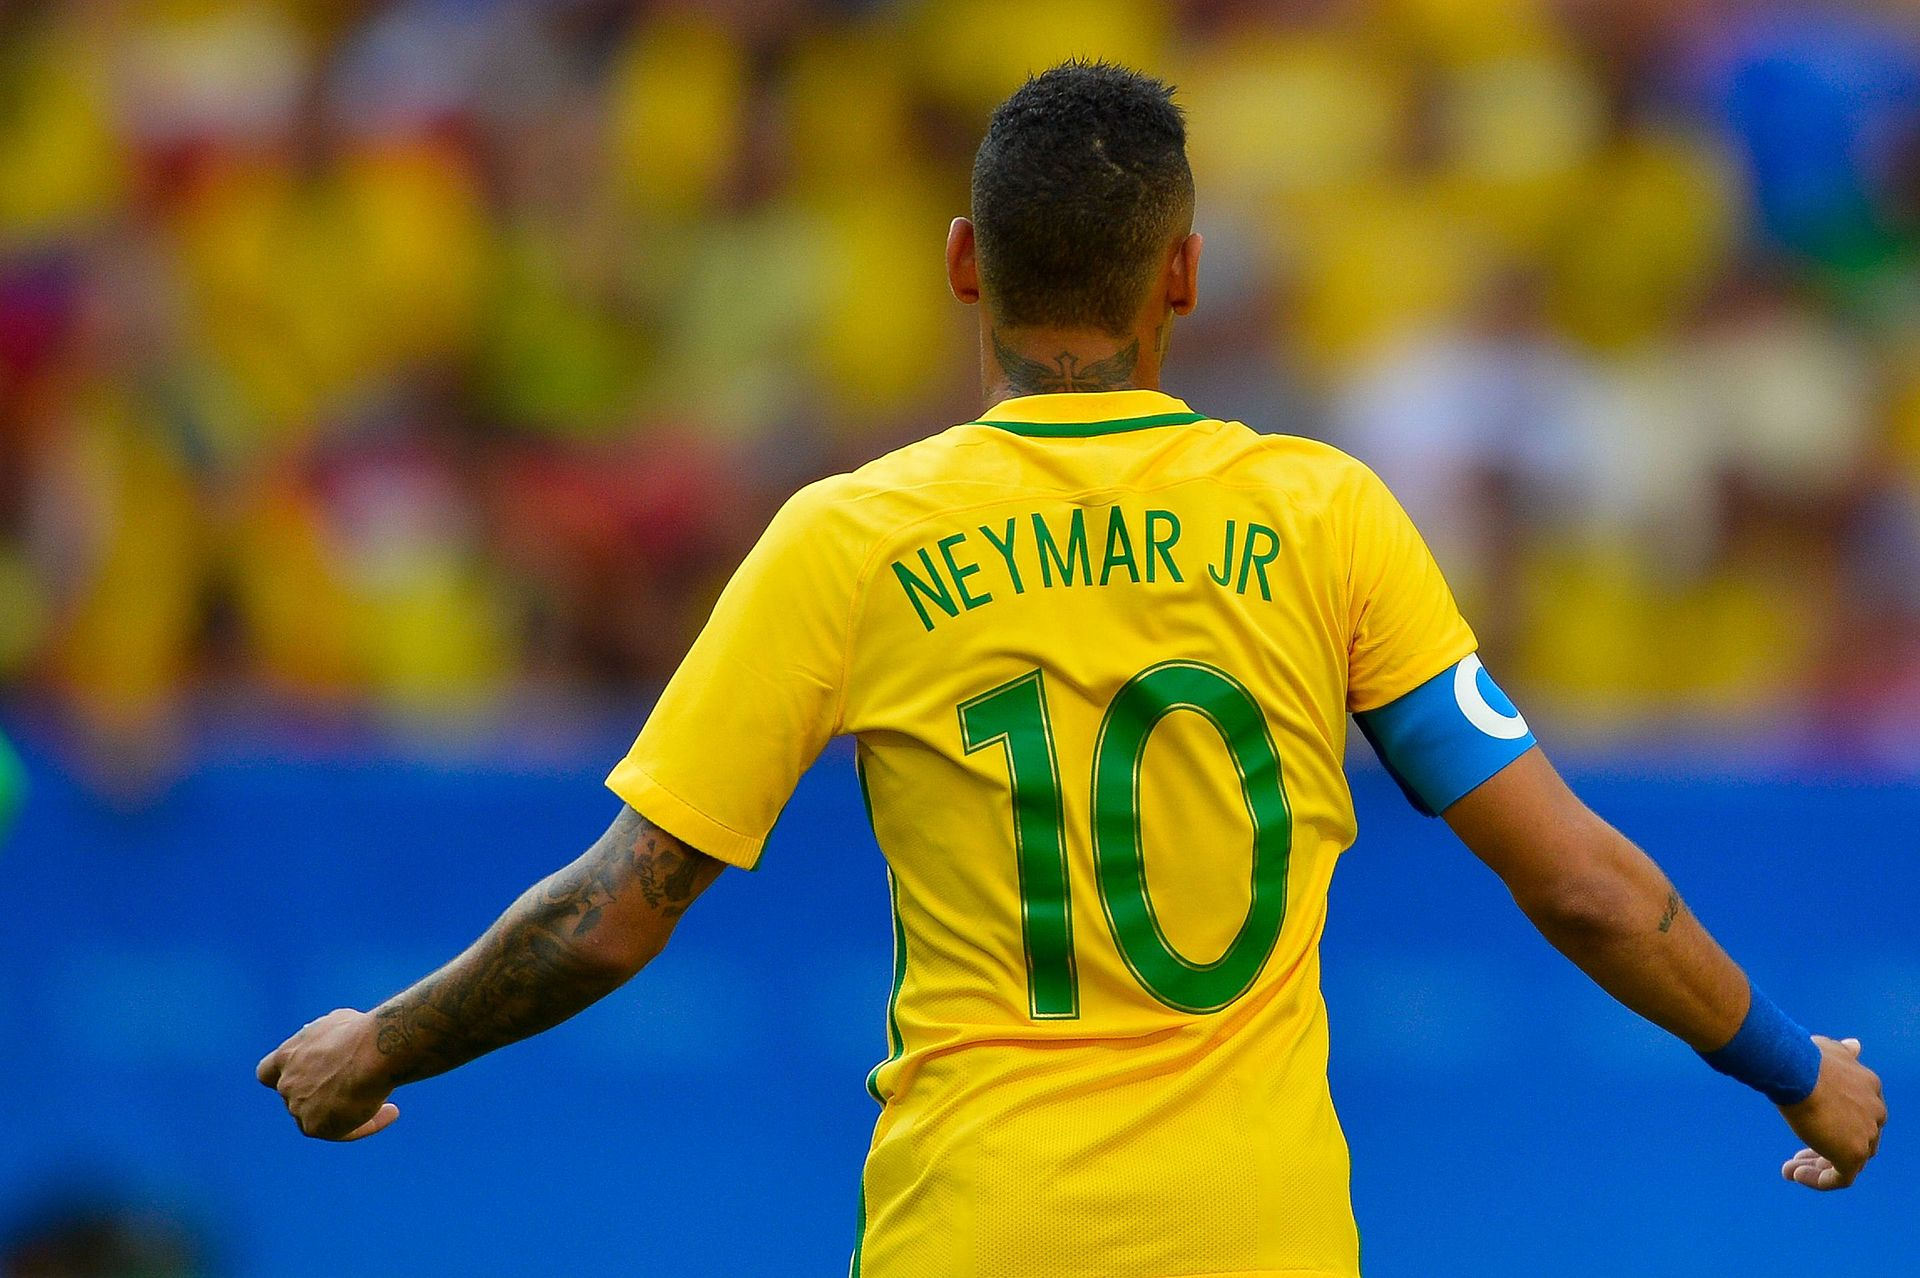 Le transfert de Neymar au PSG: un joli passement de jambes